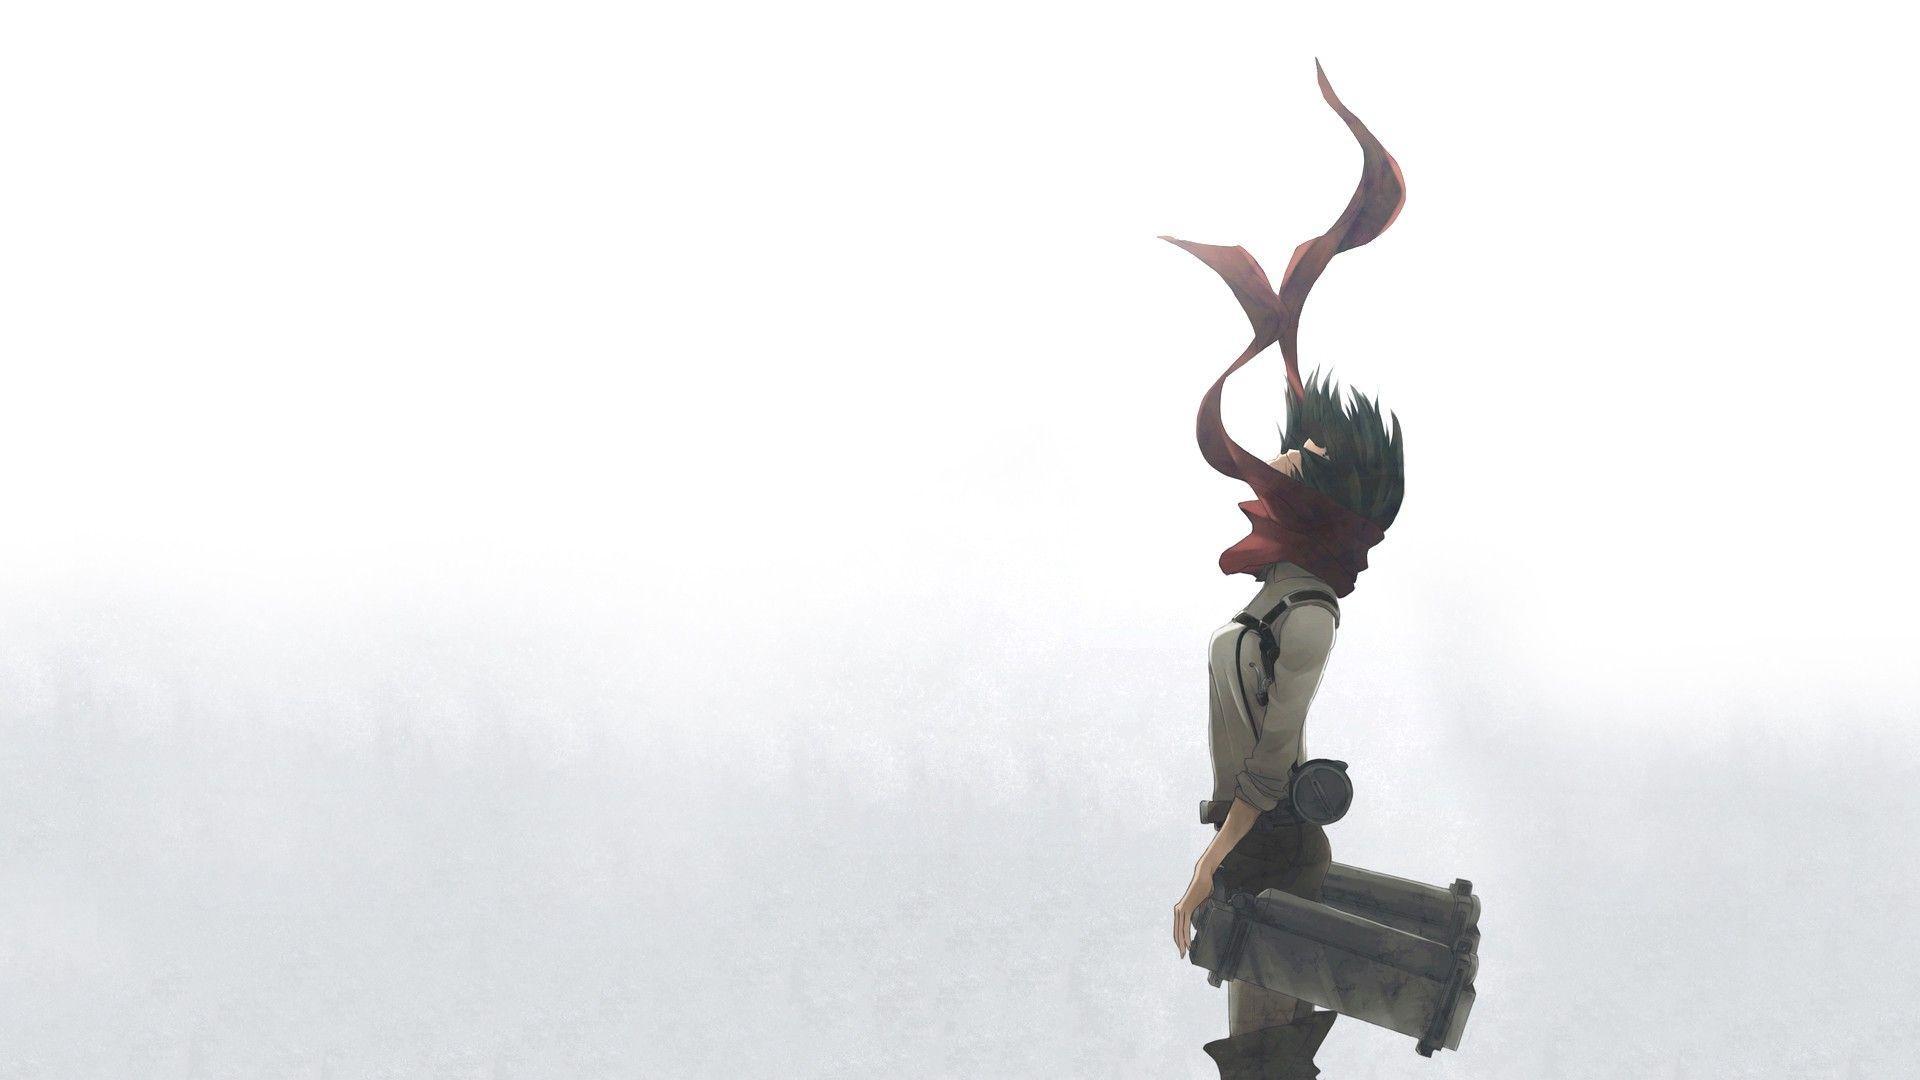 Attack On Titan Mikasa Ackerman Wallpapers Wallpaper Cave